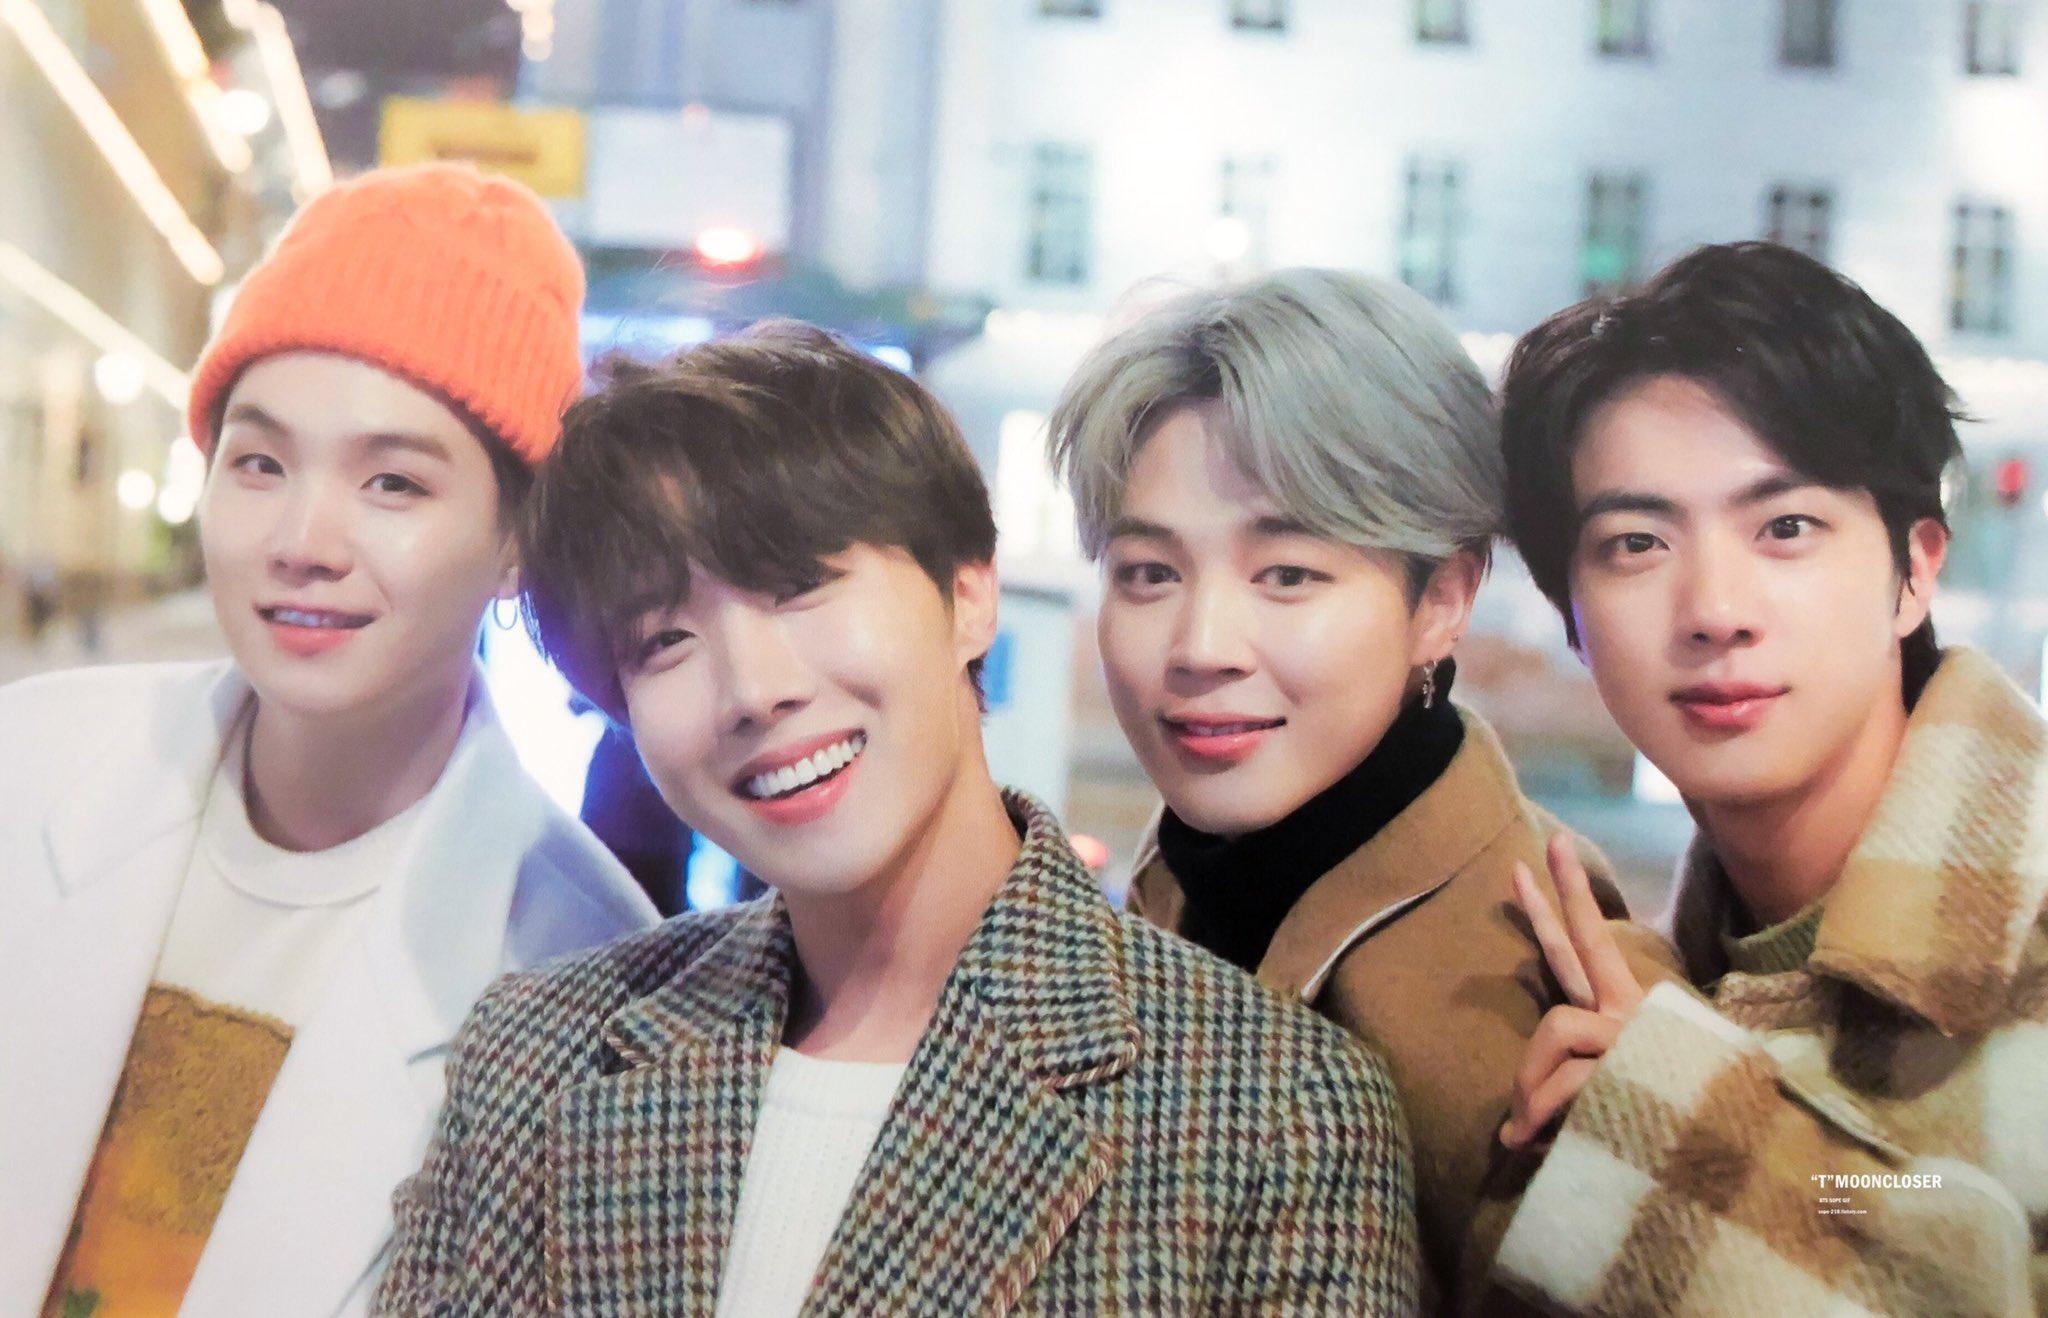 BTS Cetak Sejarah Baru Setelah Merajai Peringkat 1 Billboard Social 50 Chart Selama 164 Minggu Berturut-turut